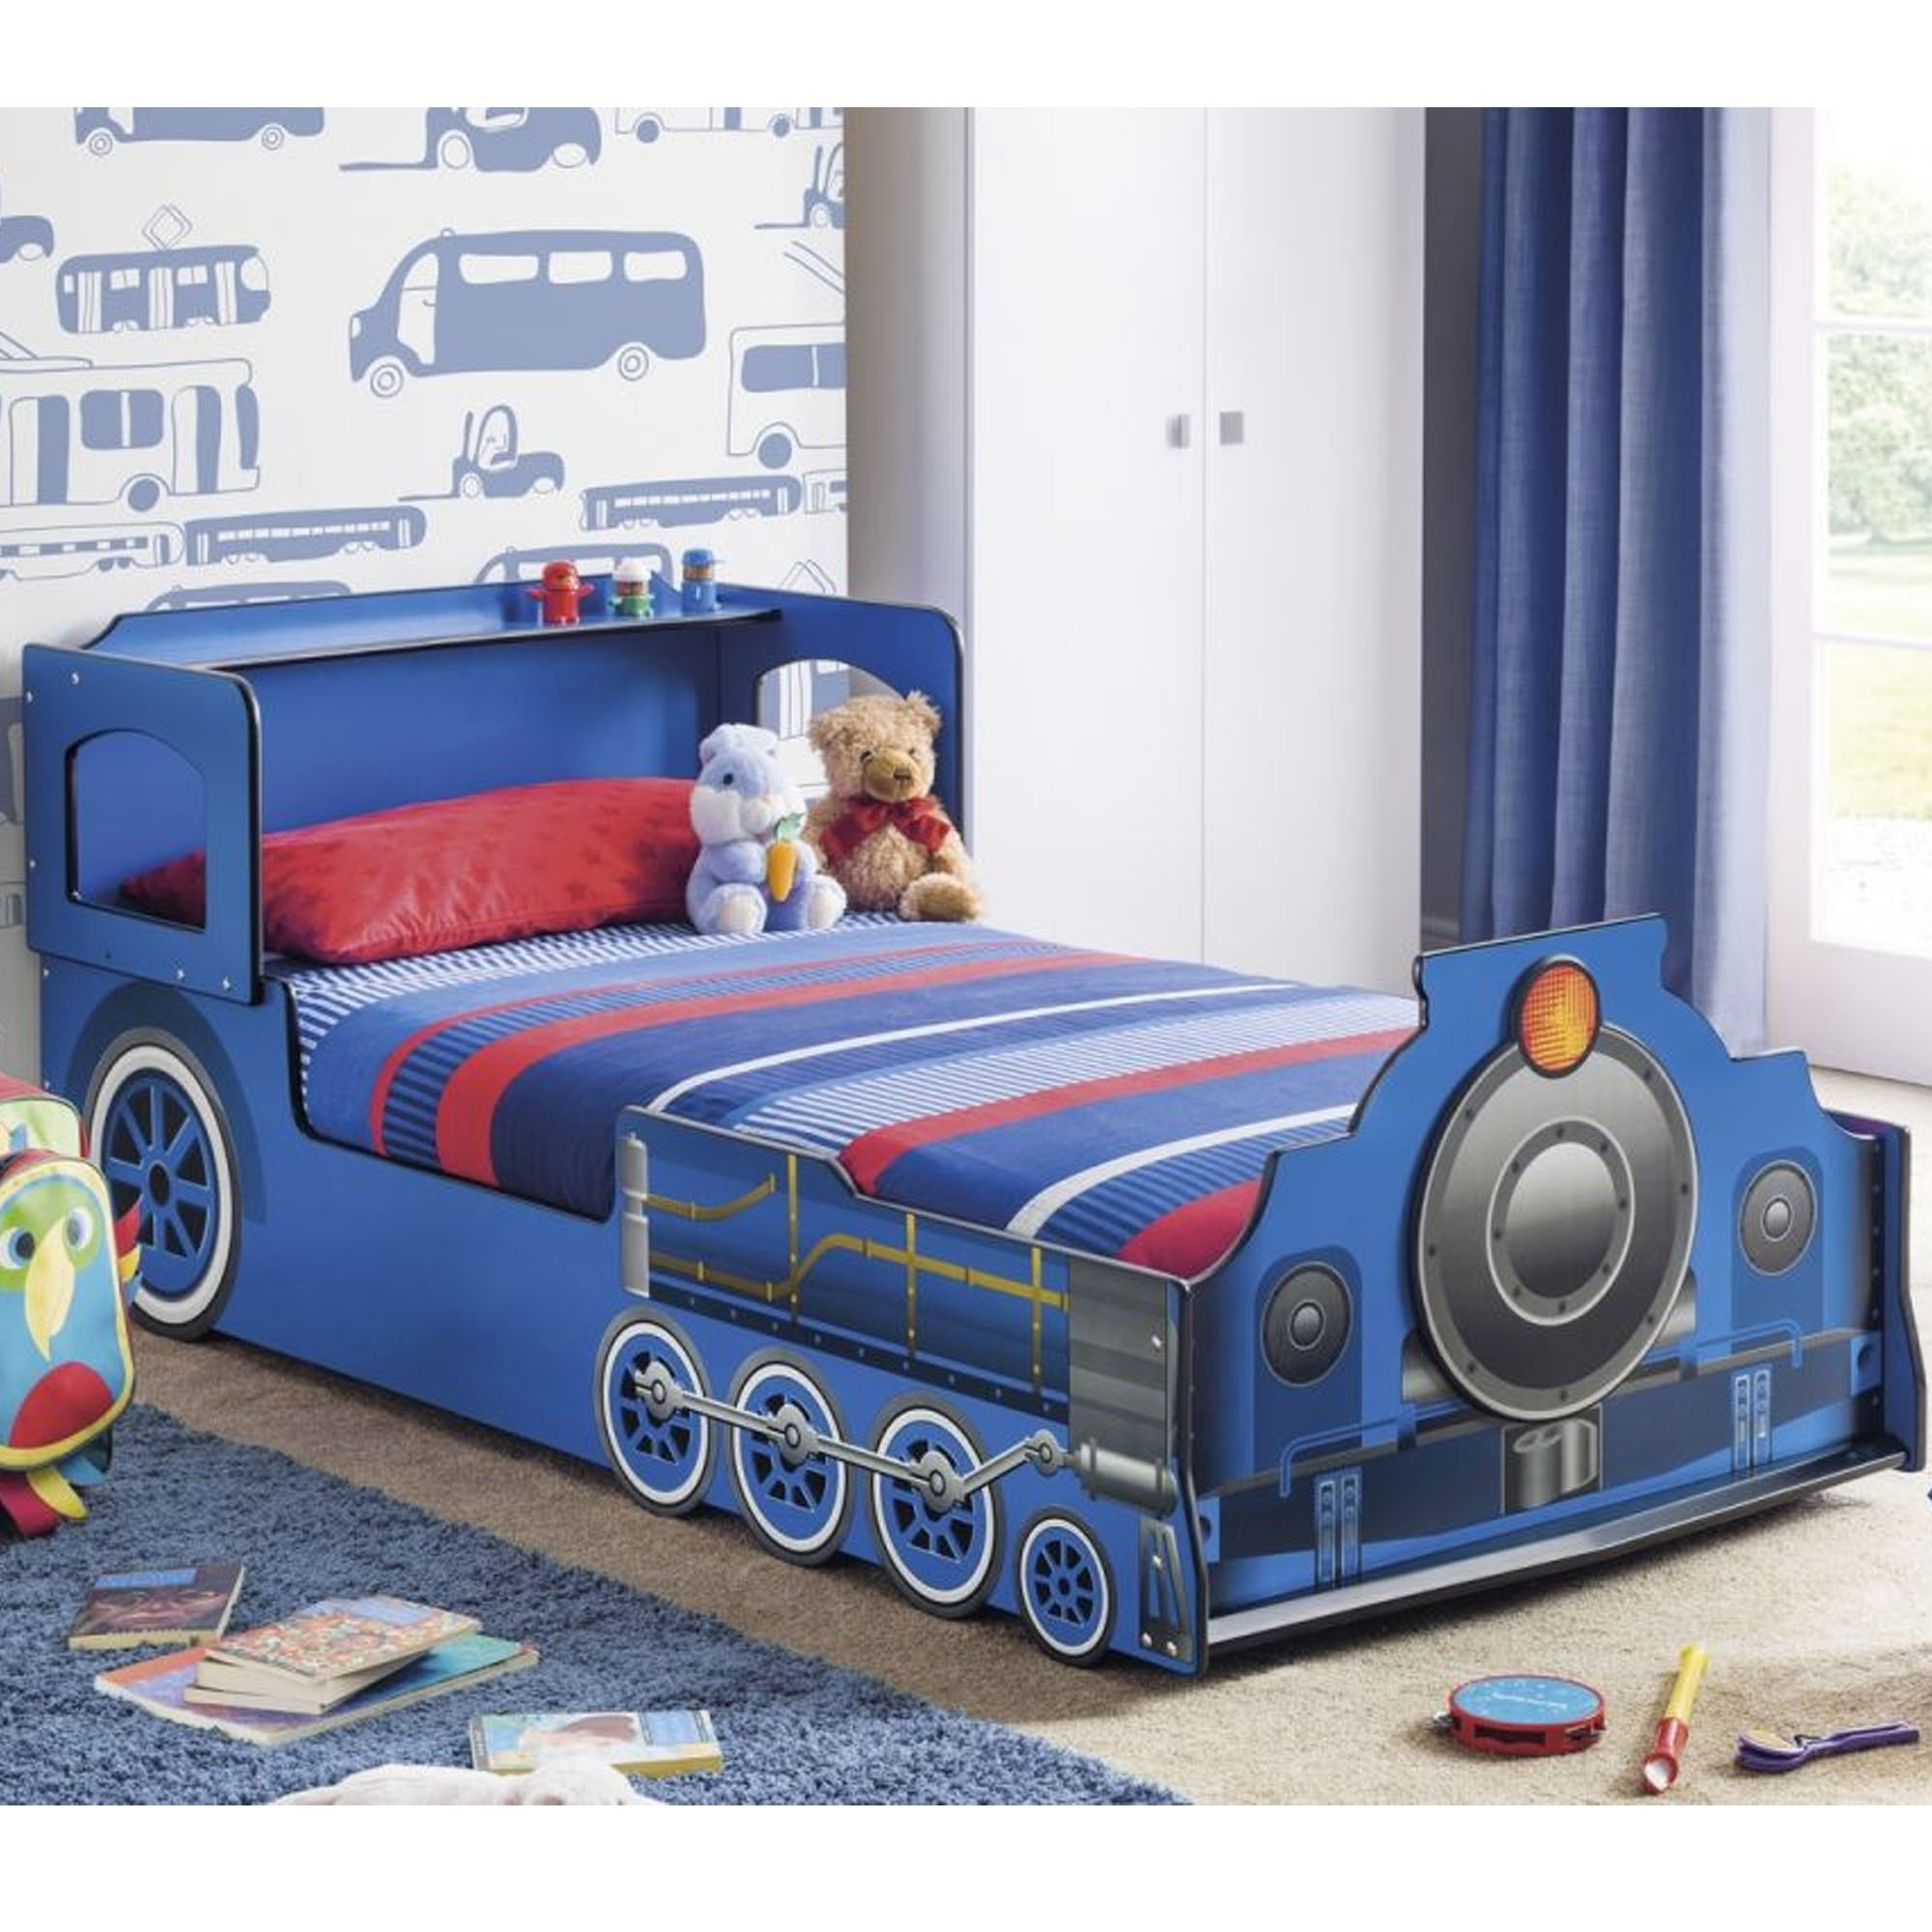 Tommy Train Bed Children S Bedroom Furniture